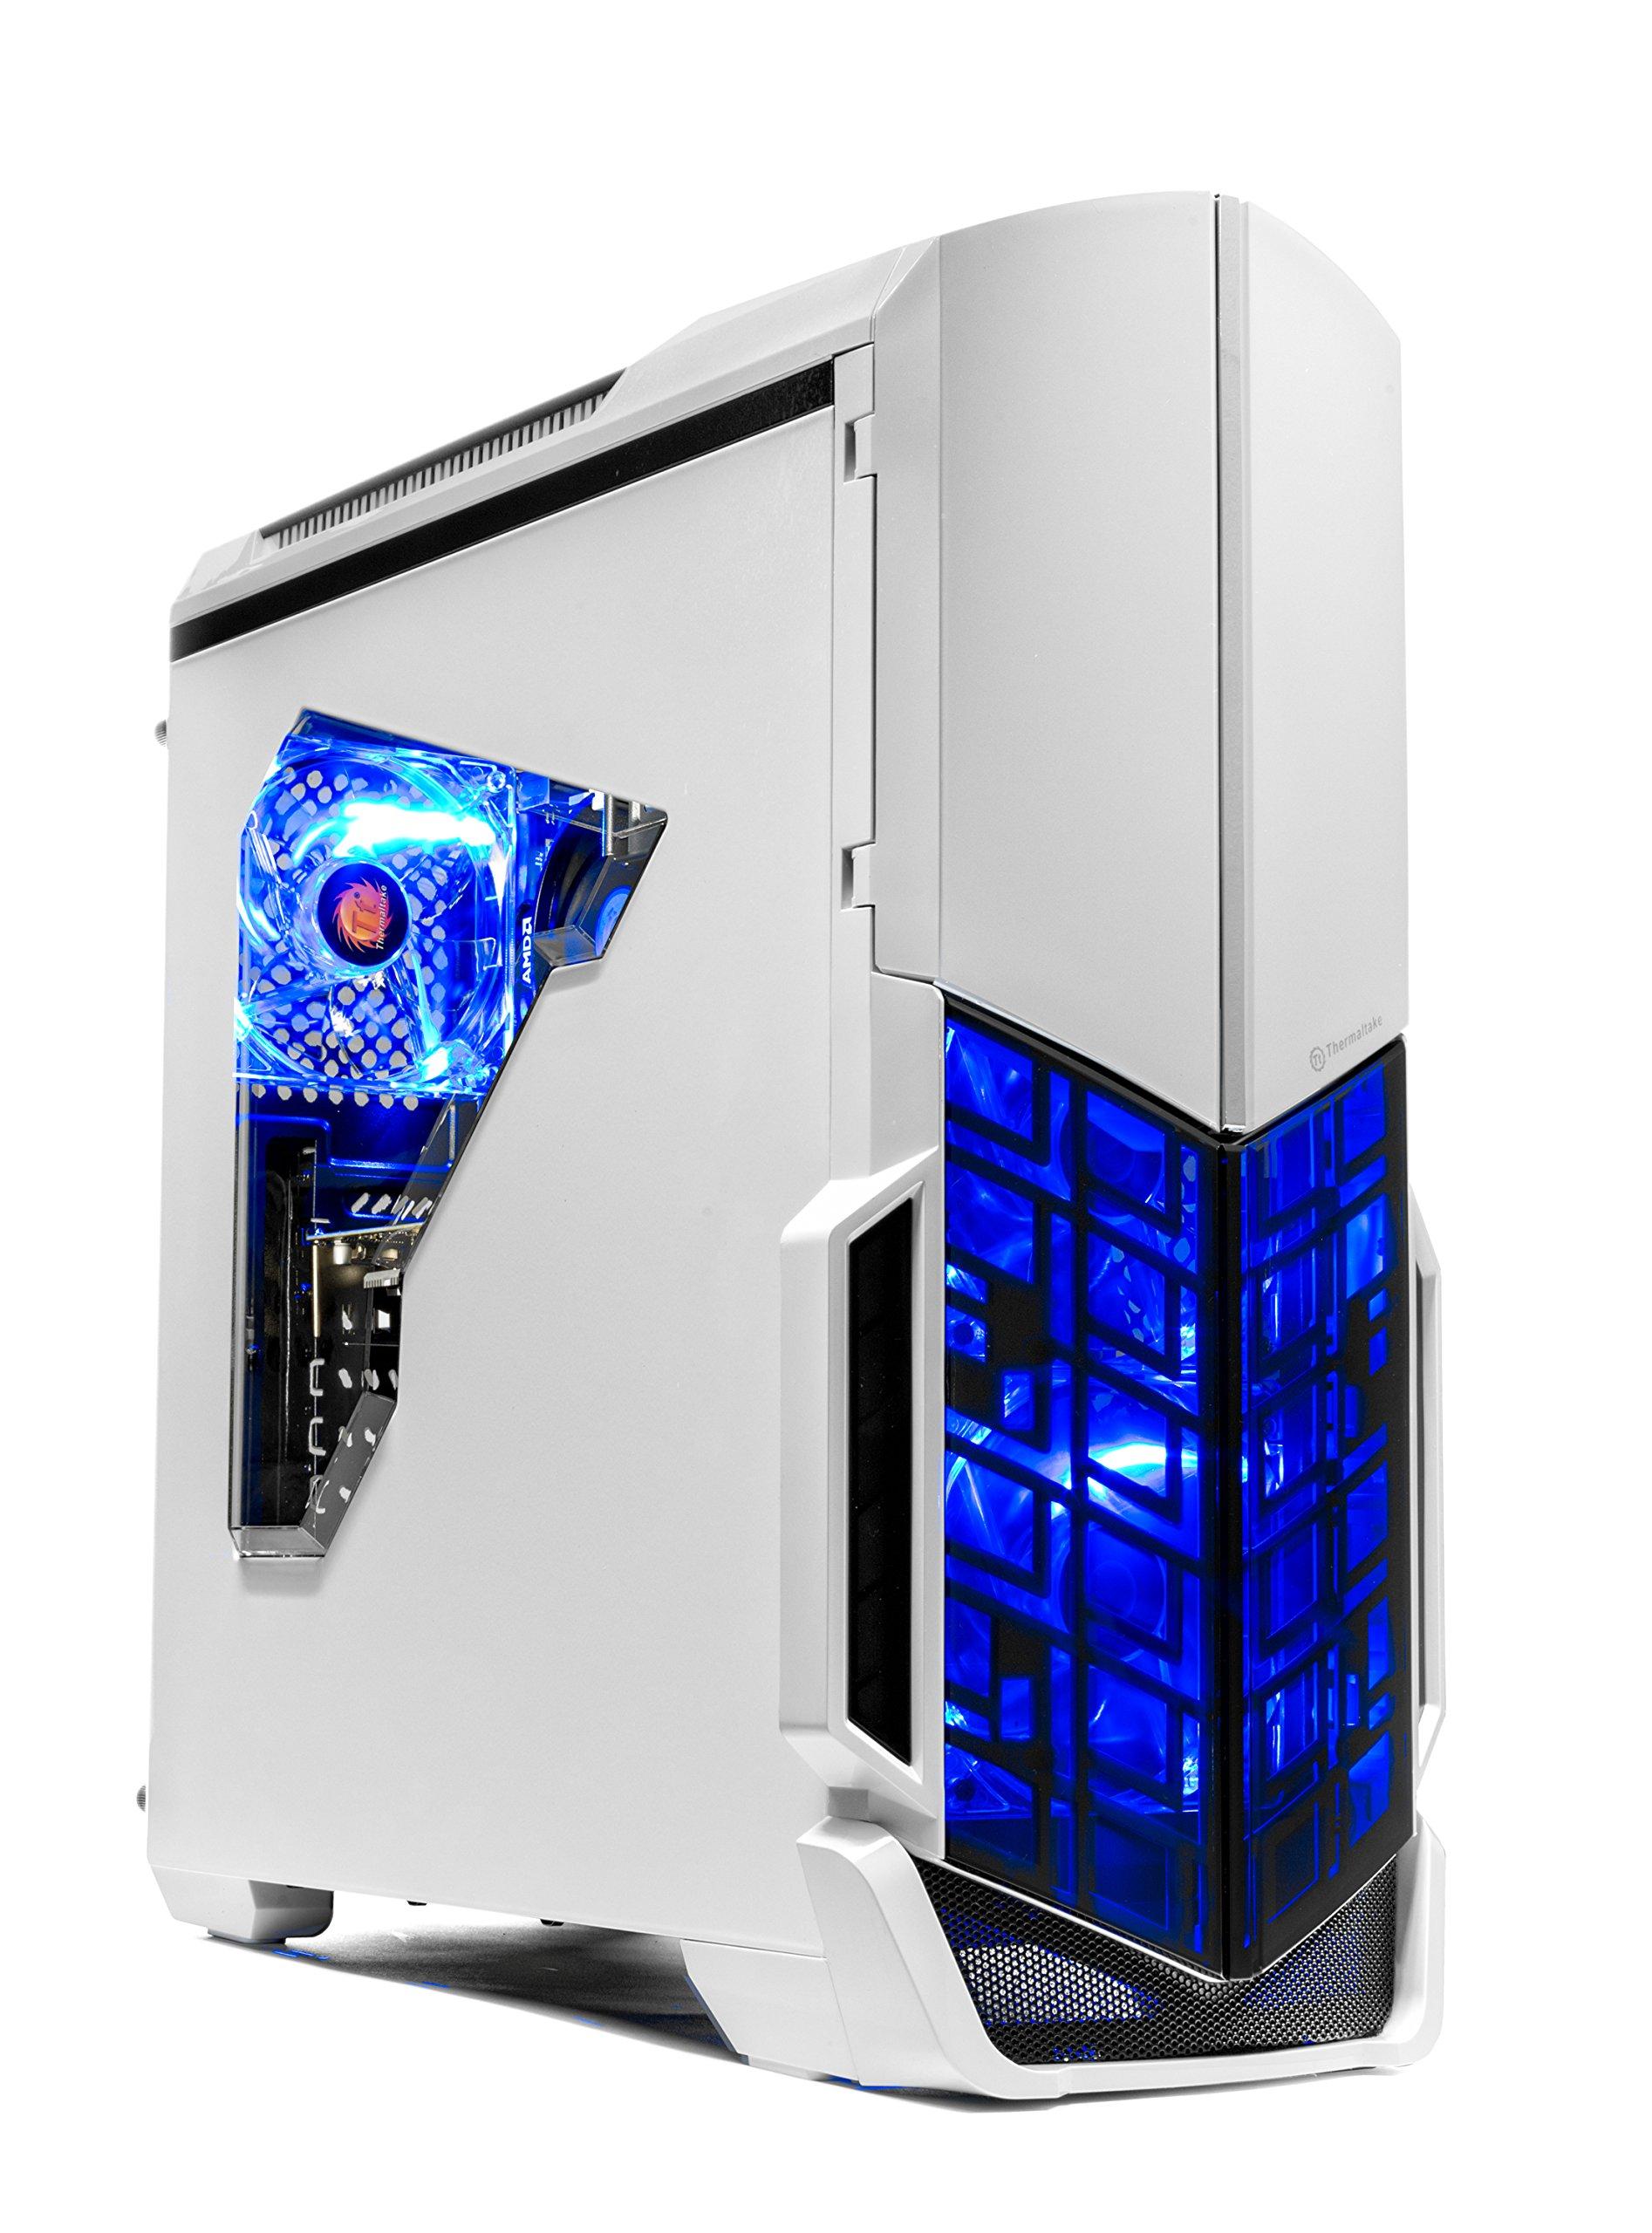 [Ryzen & GTX 1050 Ti Edition] SkyTech ArchAngel Gaming Computer Desktop PC Ryzen 1200 3.1GHz Quad-Core, GTX 1050 Ti 4GB, 8GB DDR4 2400, 1TB HDD, 24X DVD, Wi-Fi USB, Windows 10 Home 64-bit by Skytech Gaming